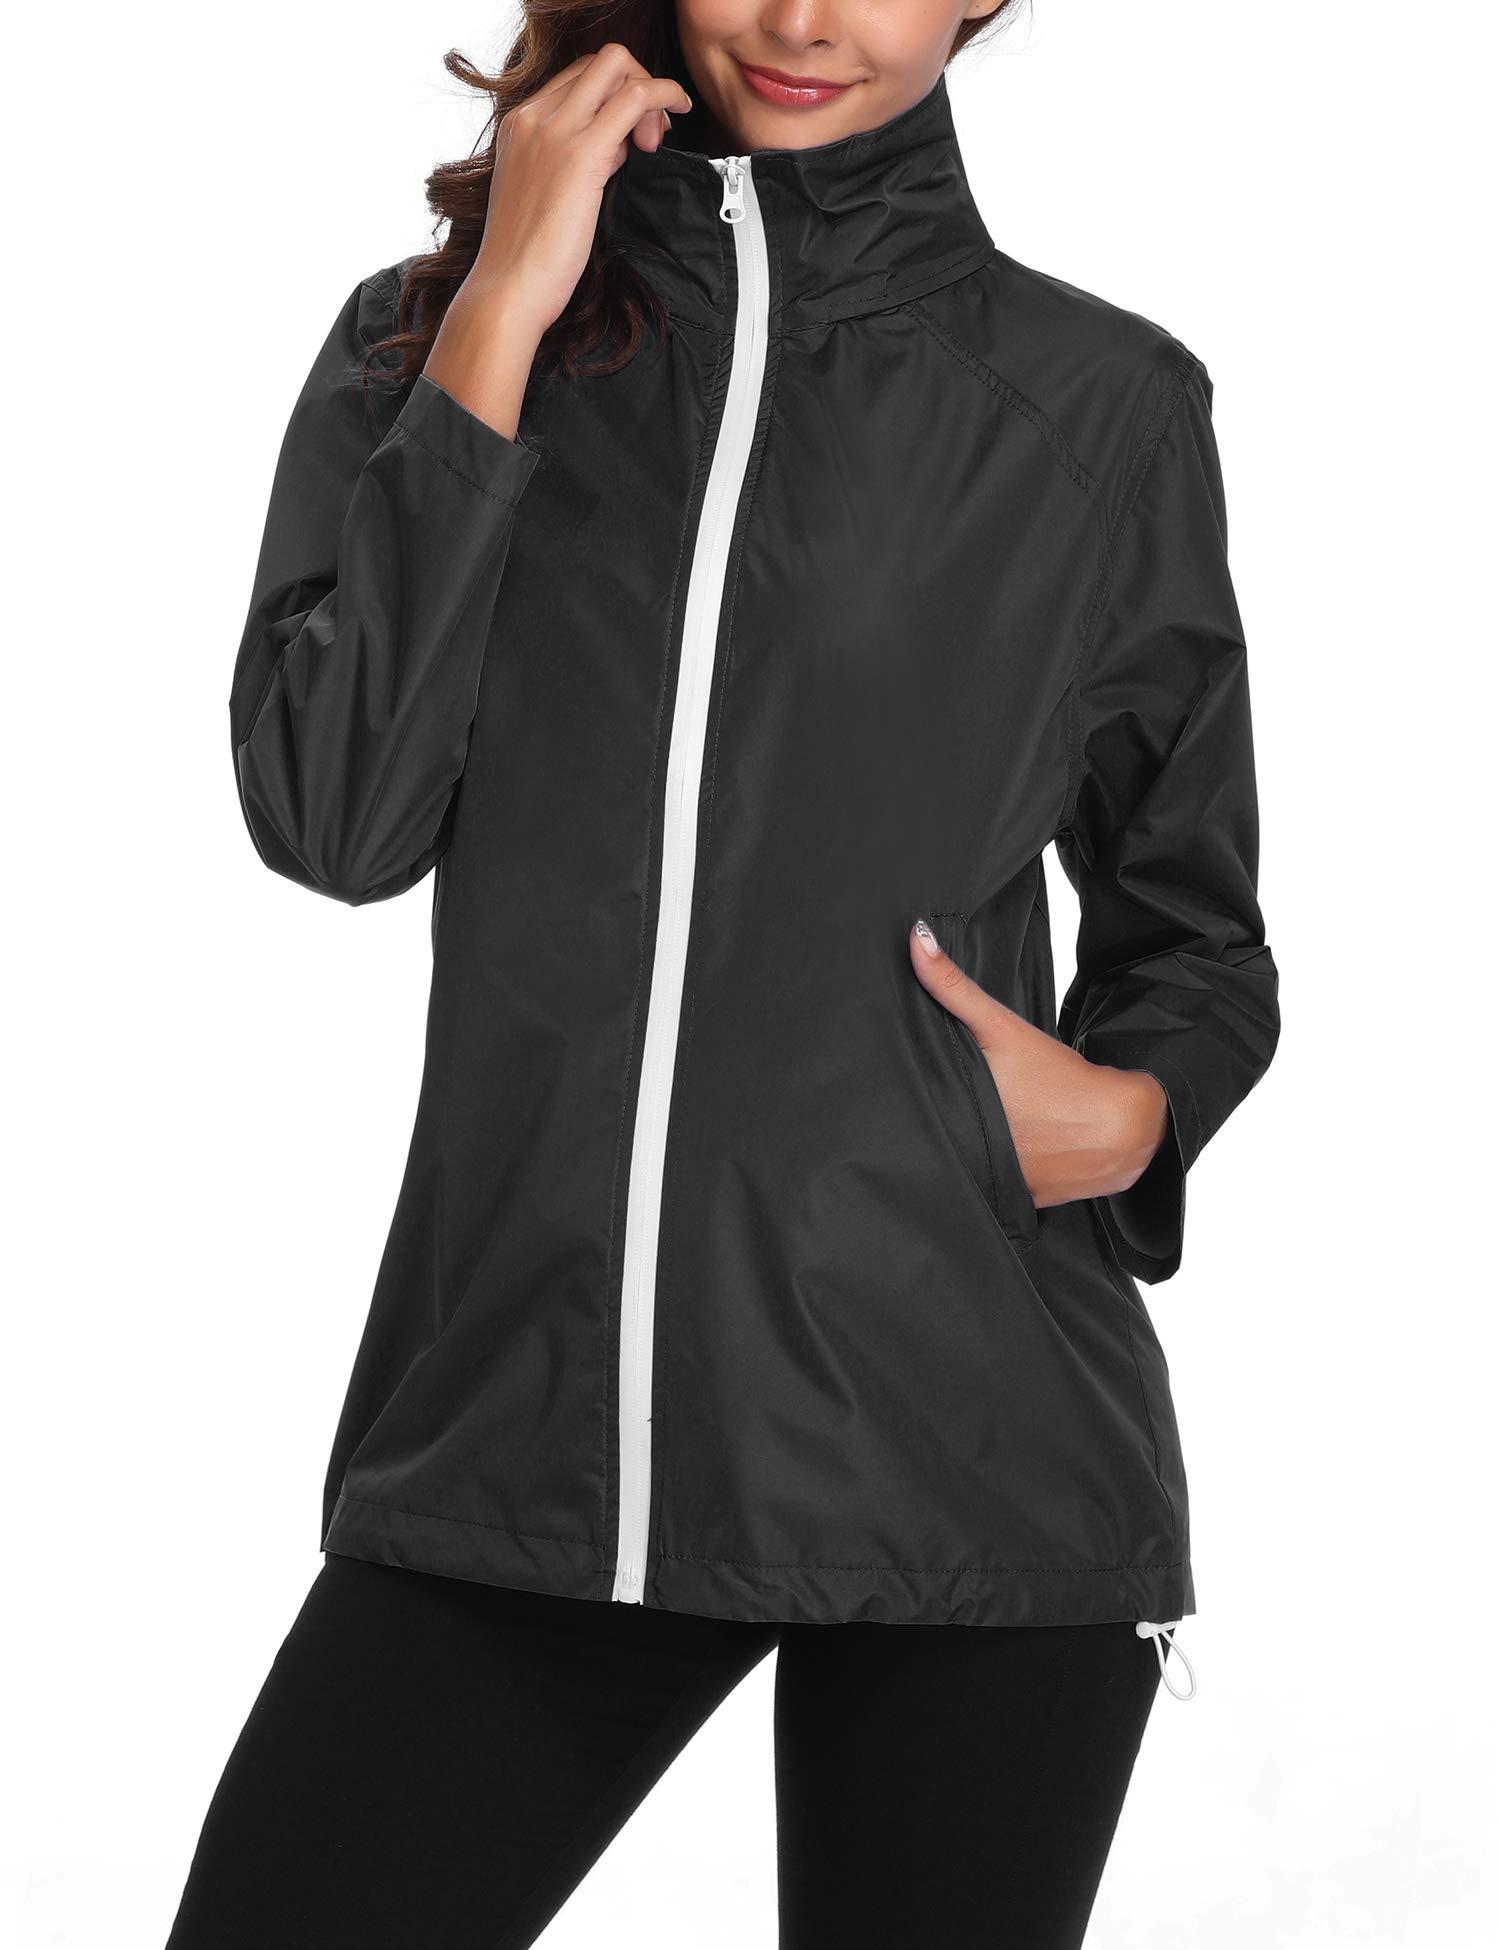 Lightweight Rain Jacket Women Waterproof Windbreaker Hooded Outdoor Hiking Raincoat Black S